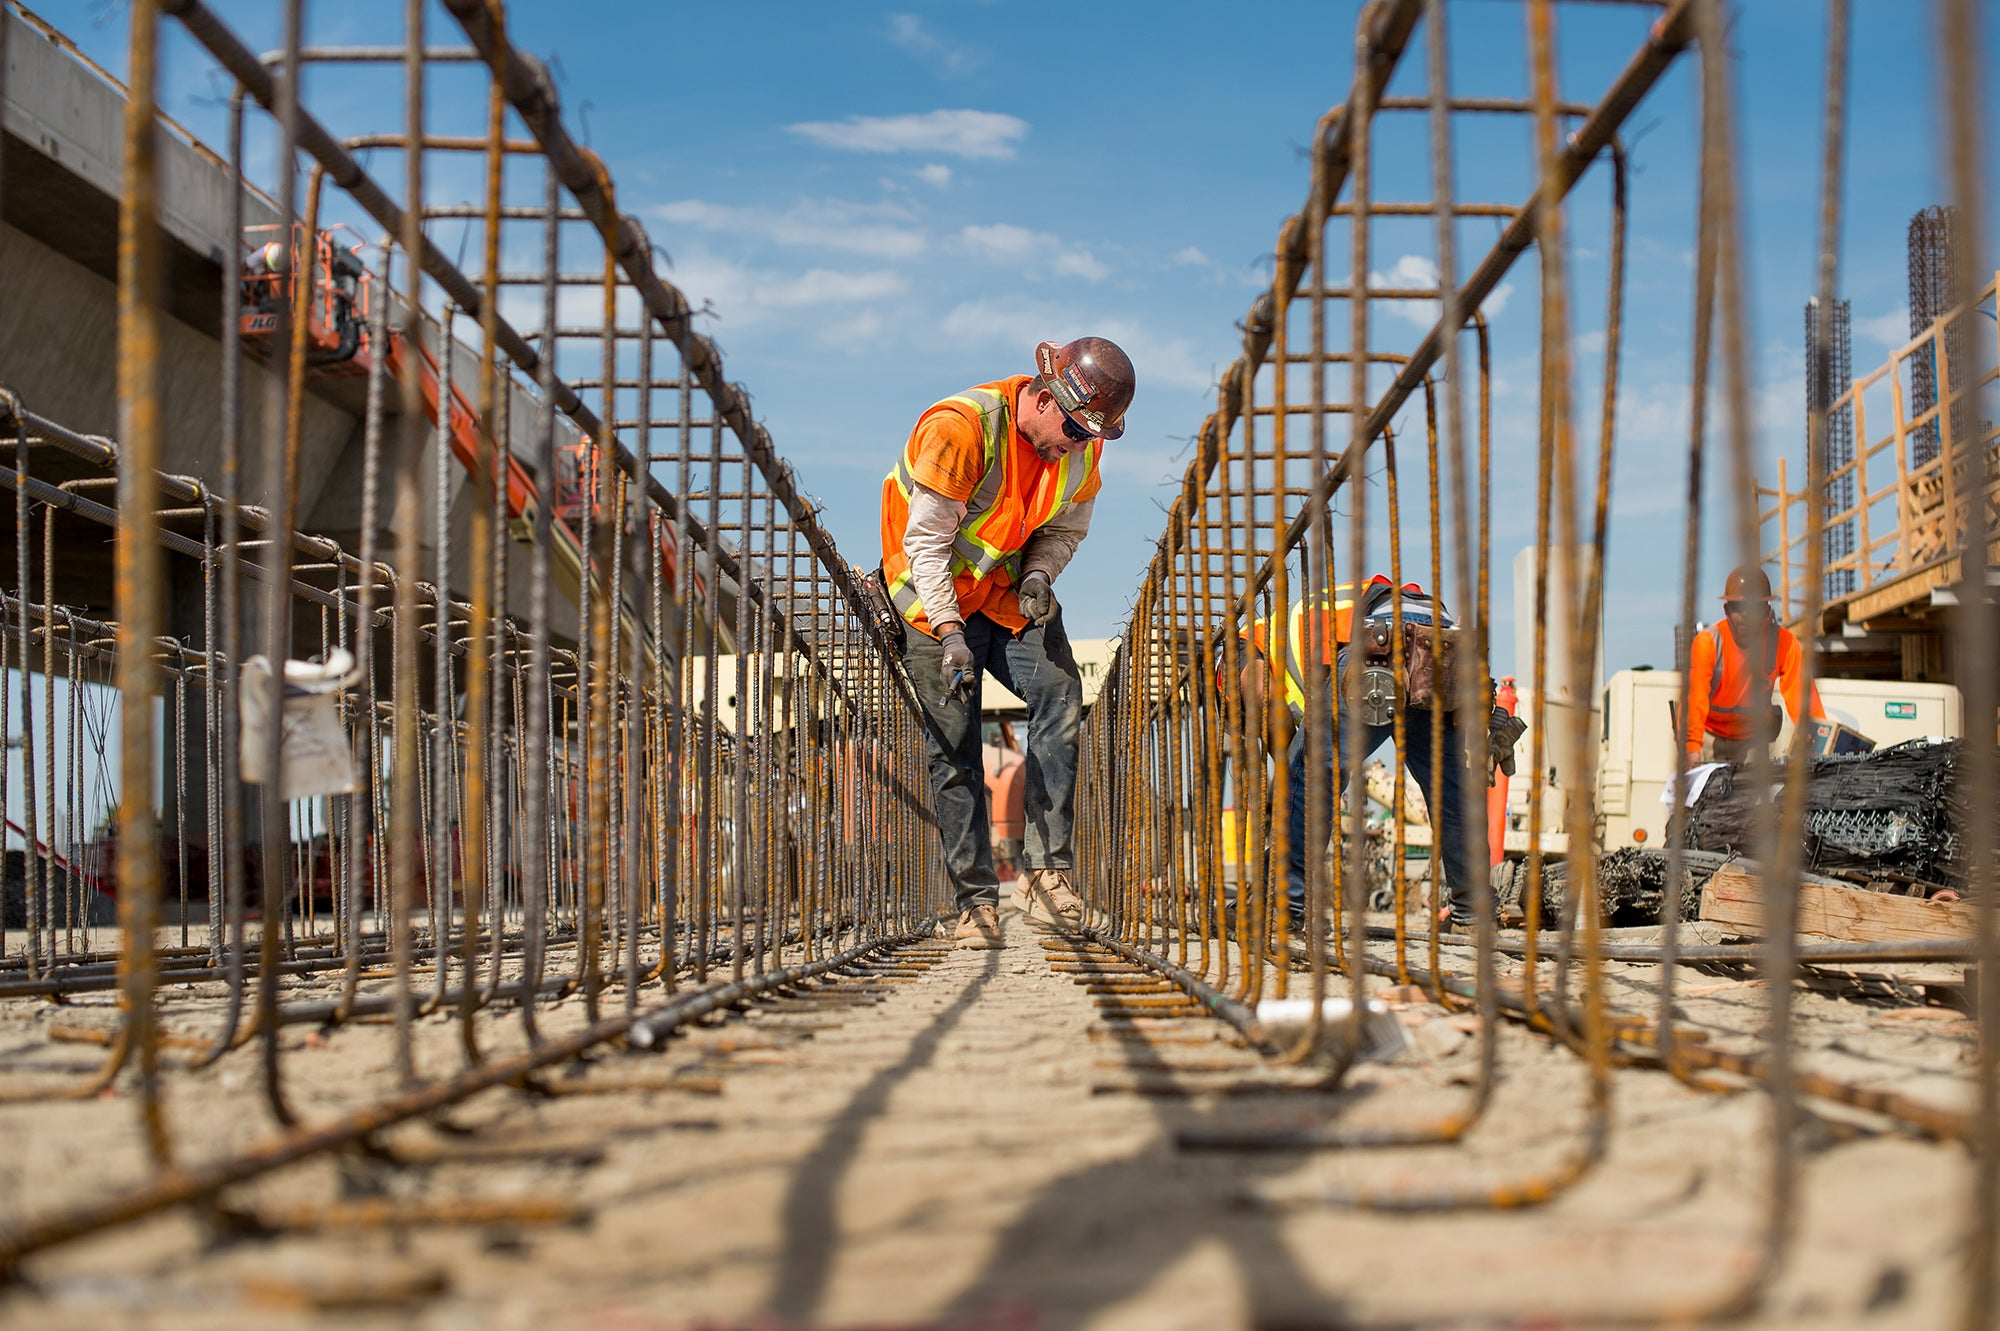 berryessa bart station worker bret fletcher reinforces rebar for parking structure